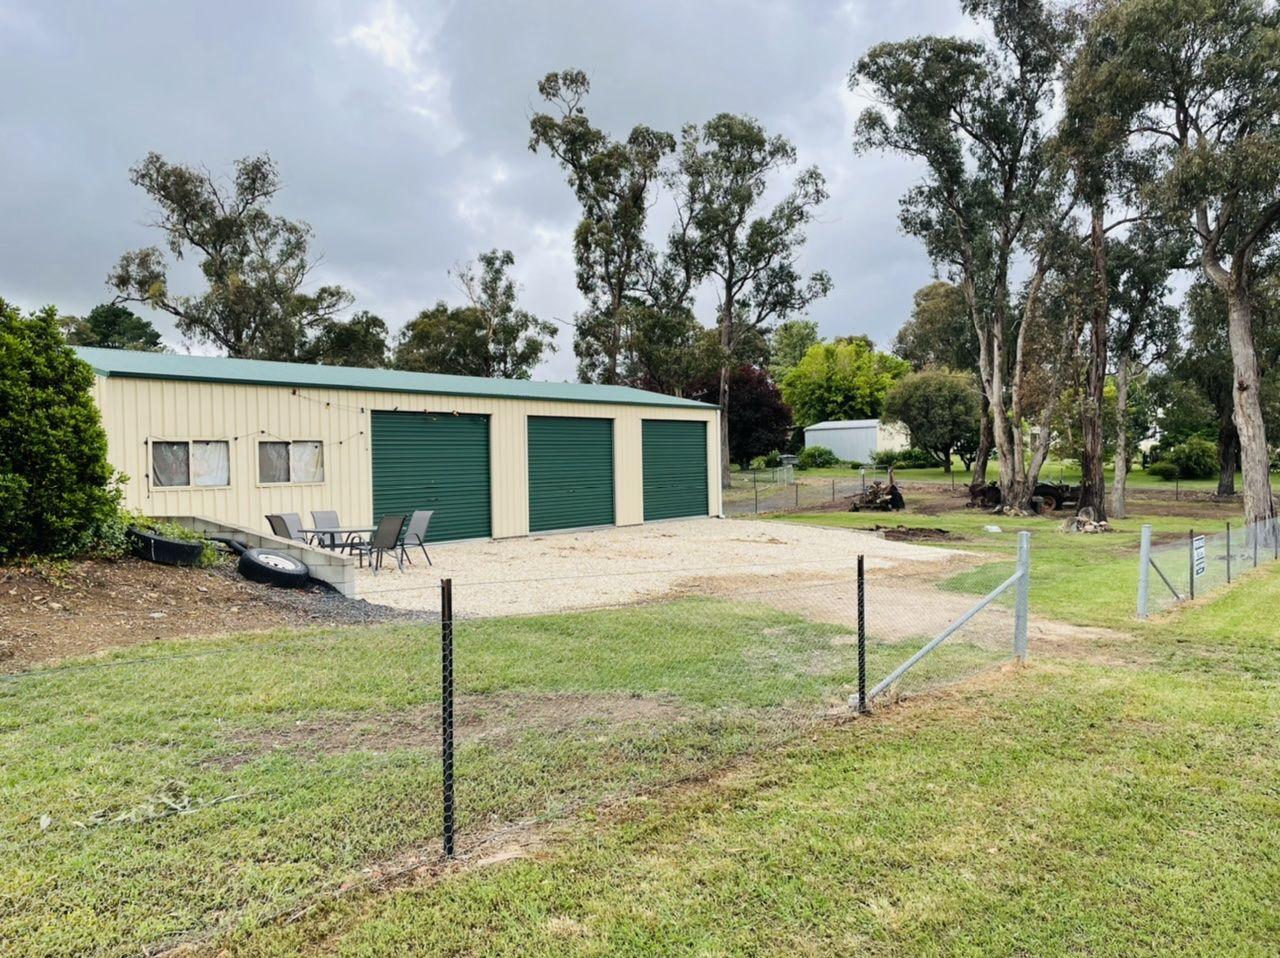 187w North St, Walcha NSW 2354, Image 1